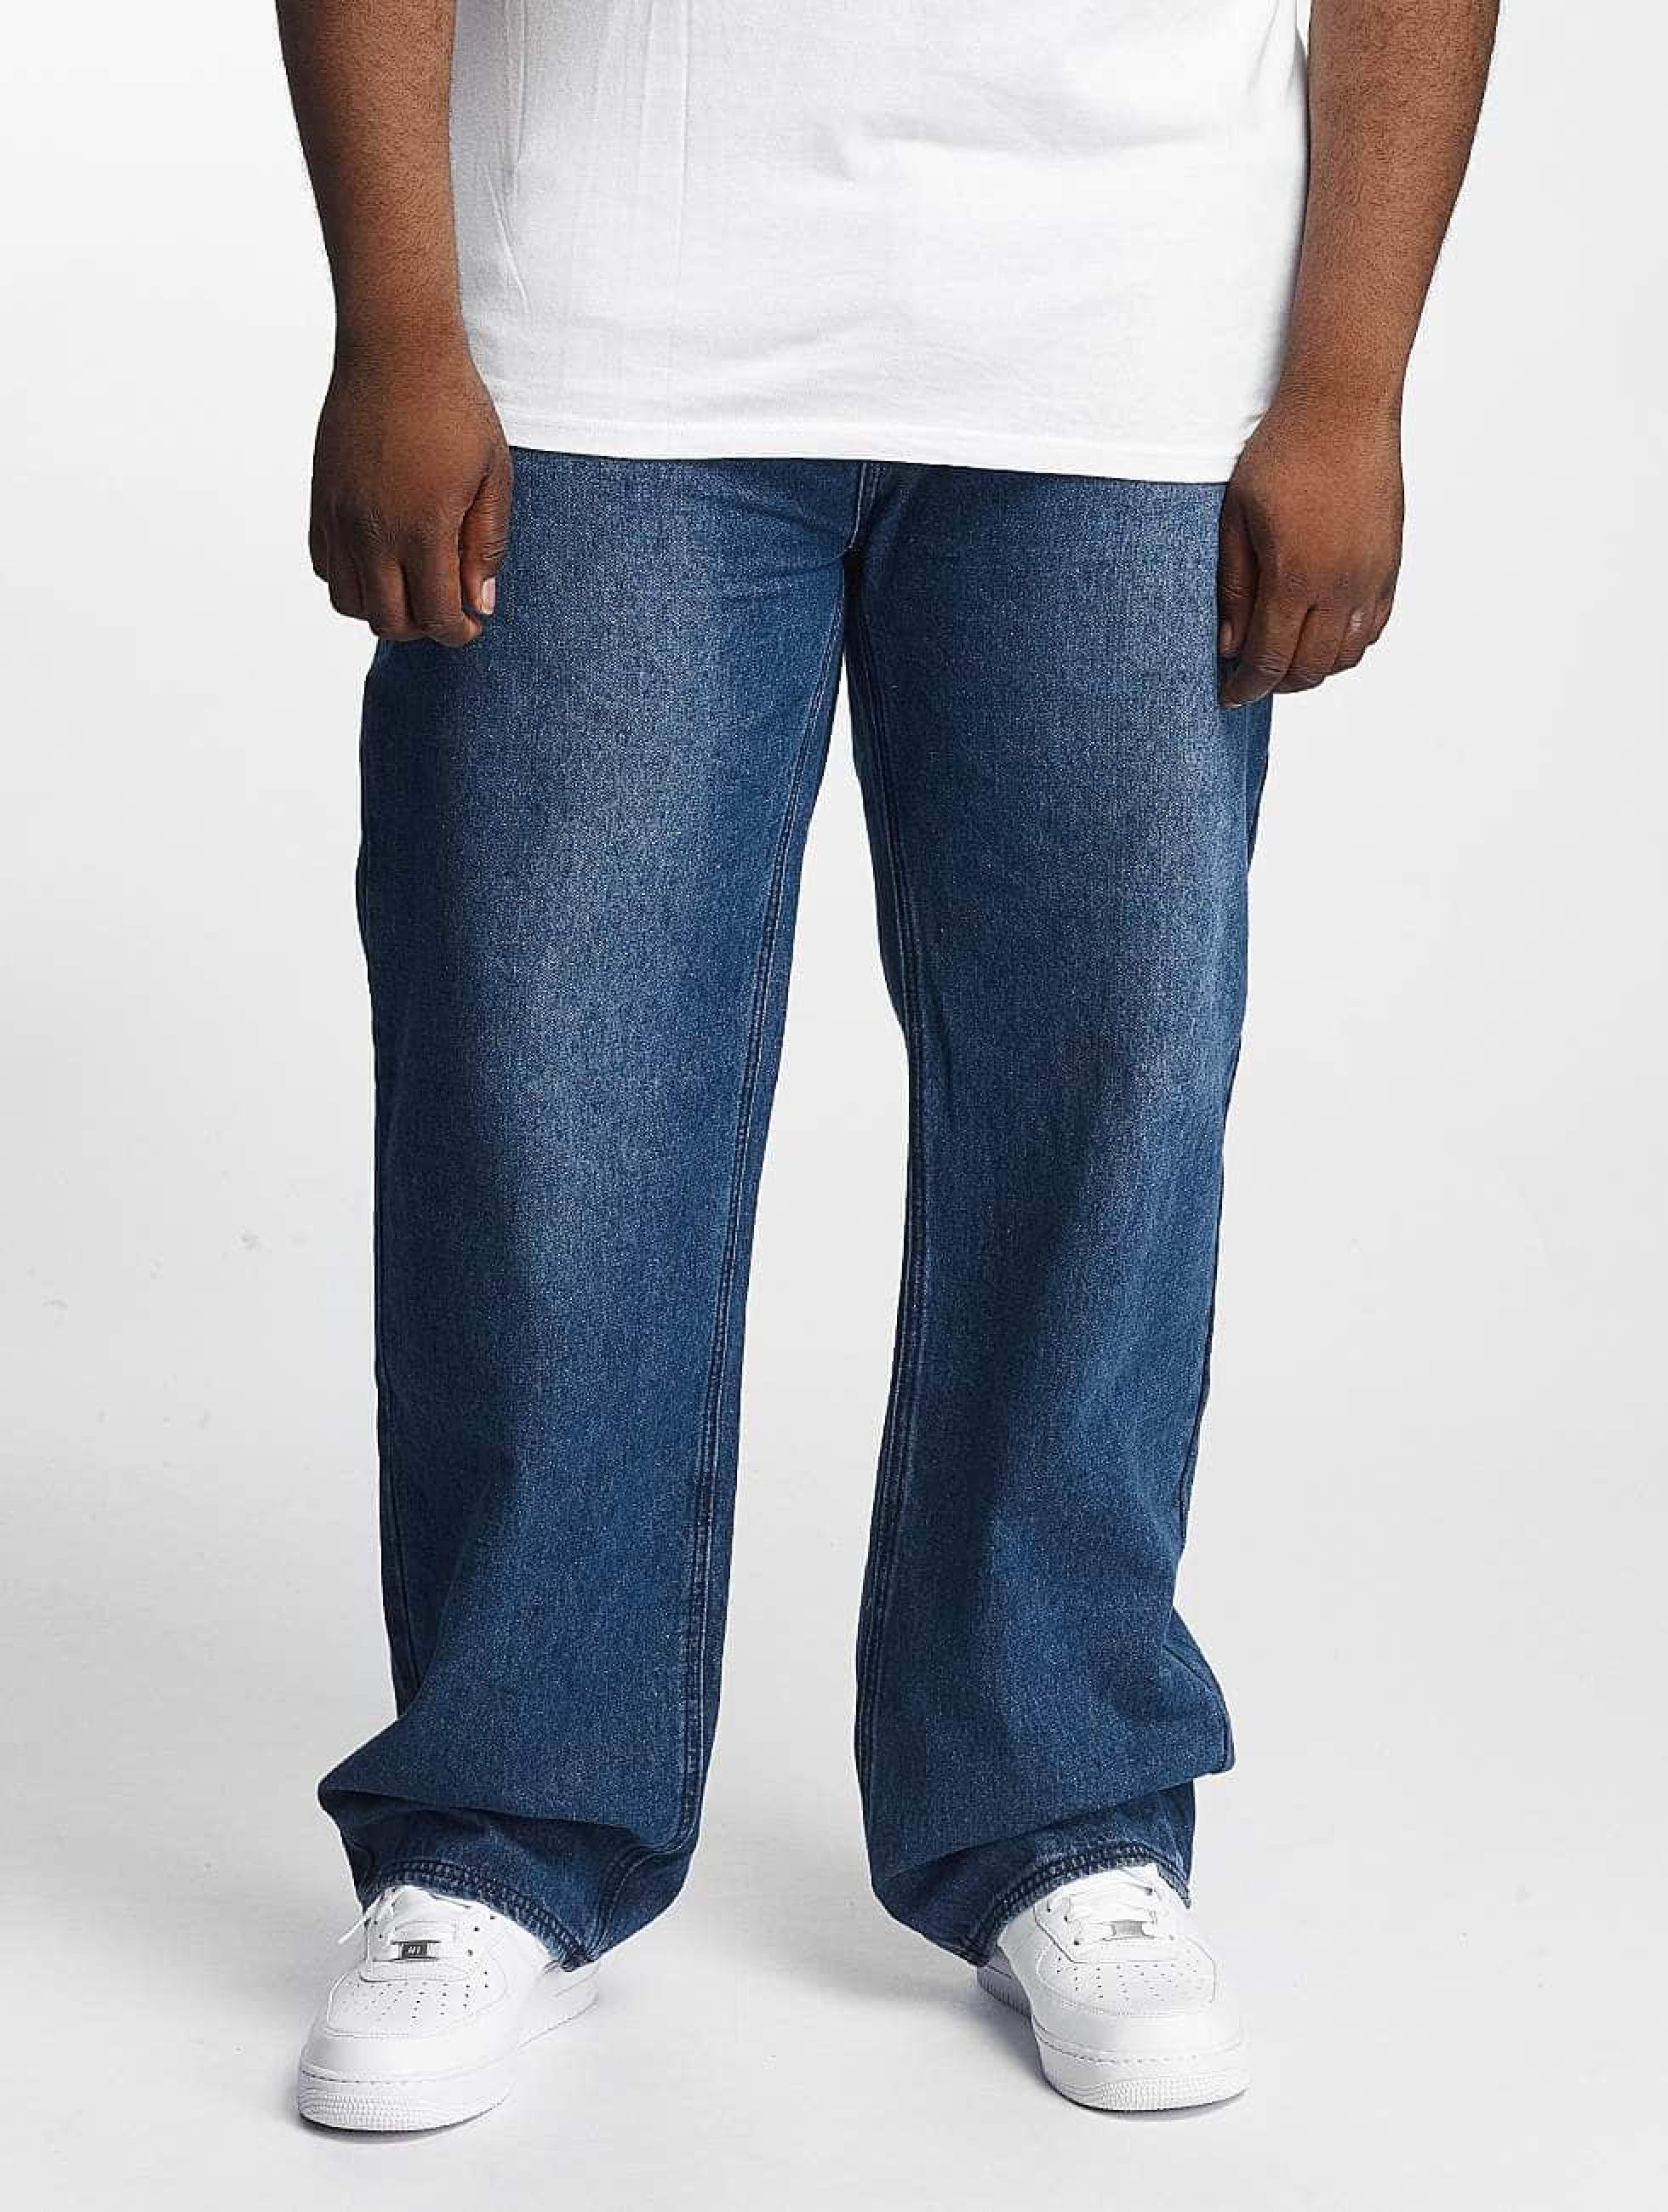 Ecko Unltd. Loose Fit Jeans Blue blau